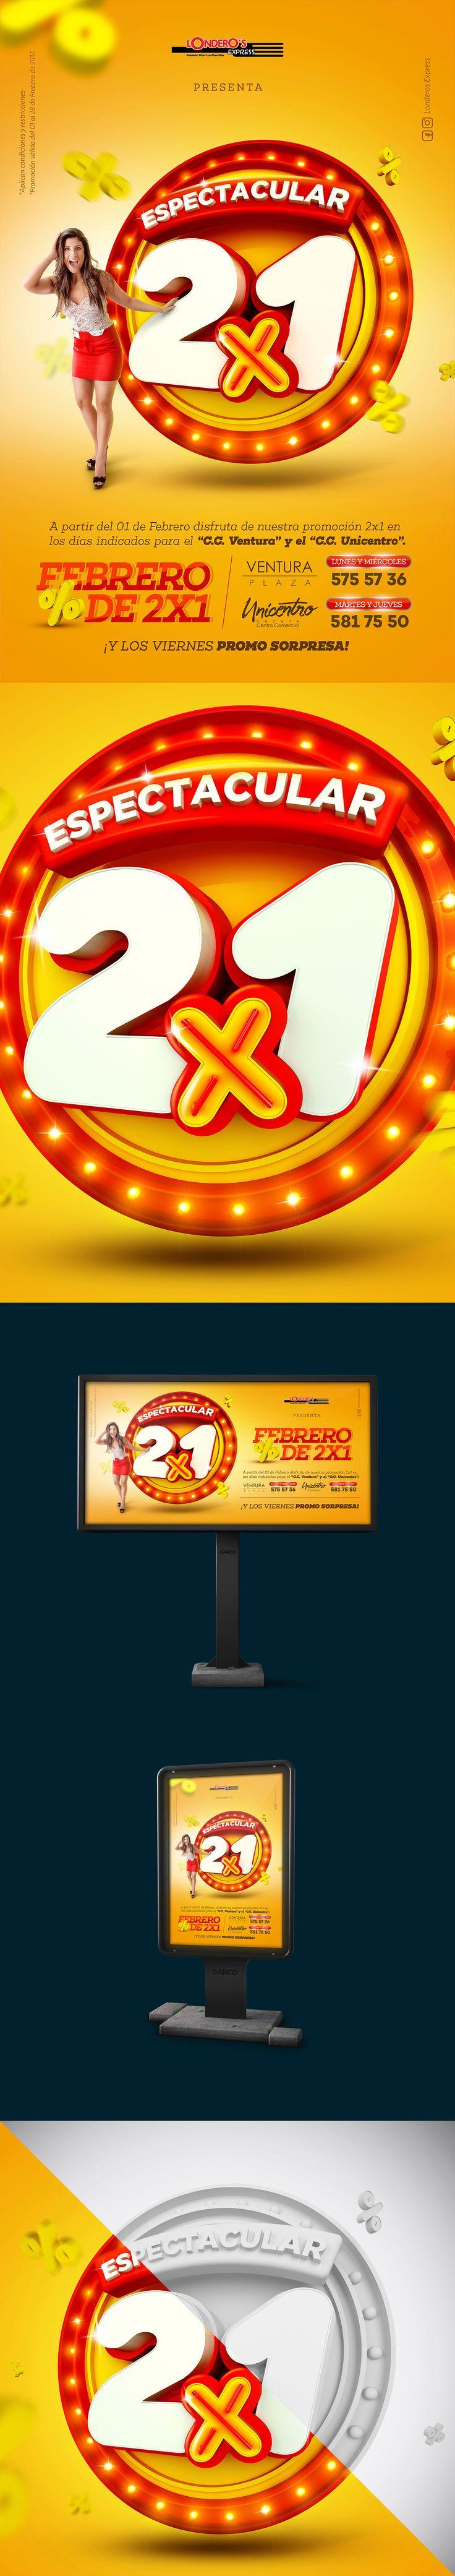 Febrero de 2x1 | Londeros Express on Behance